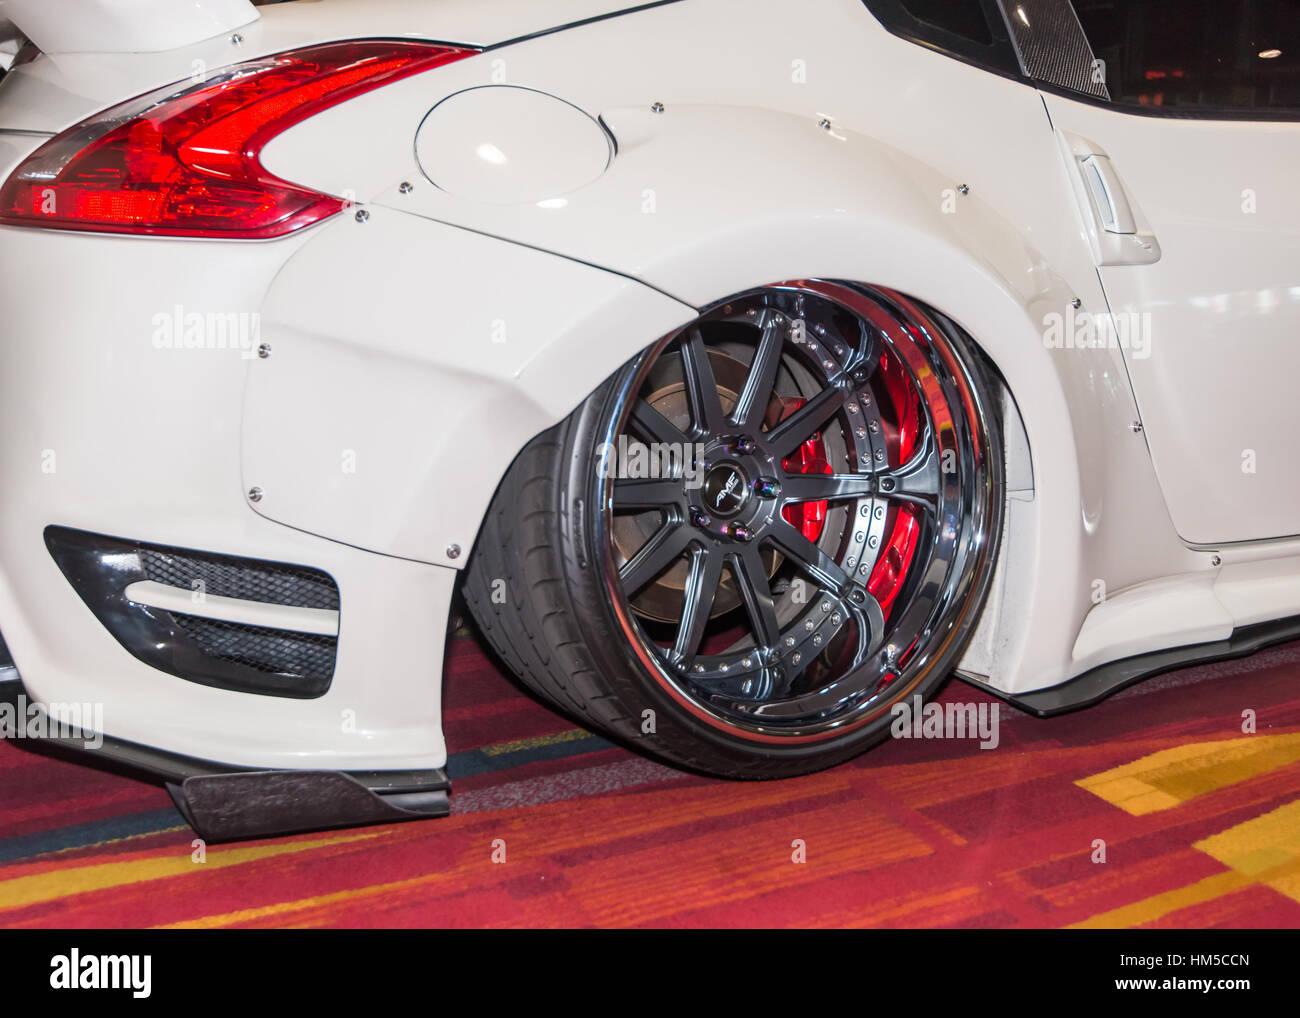 Japan custom car show stockfotos